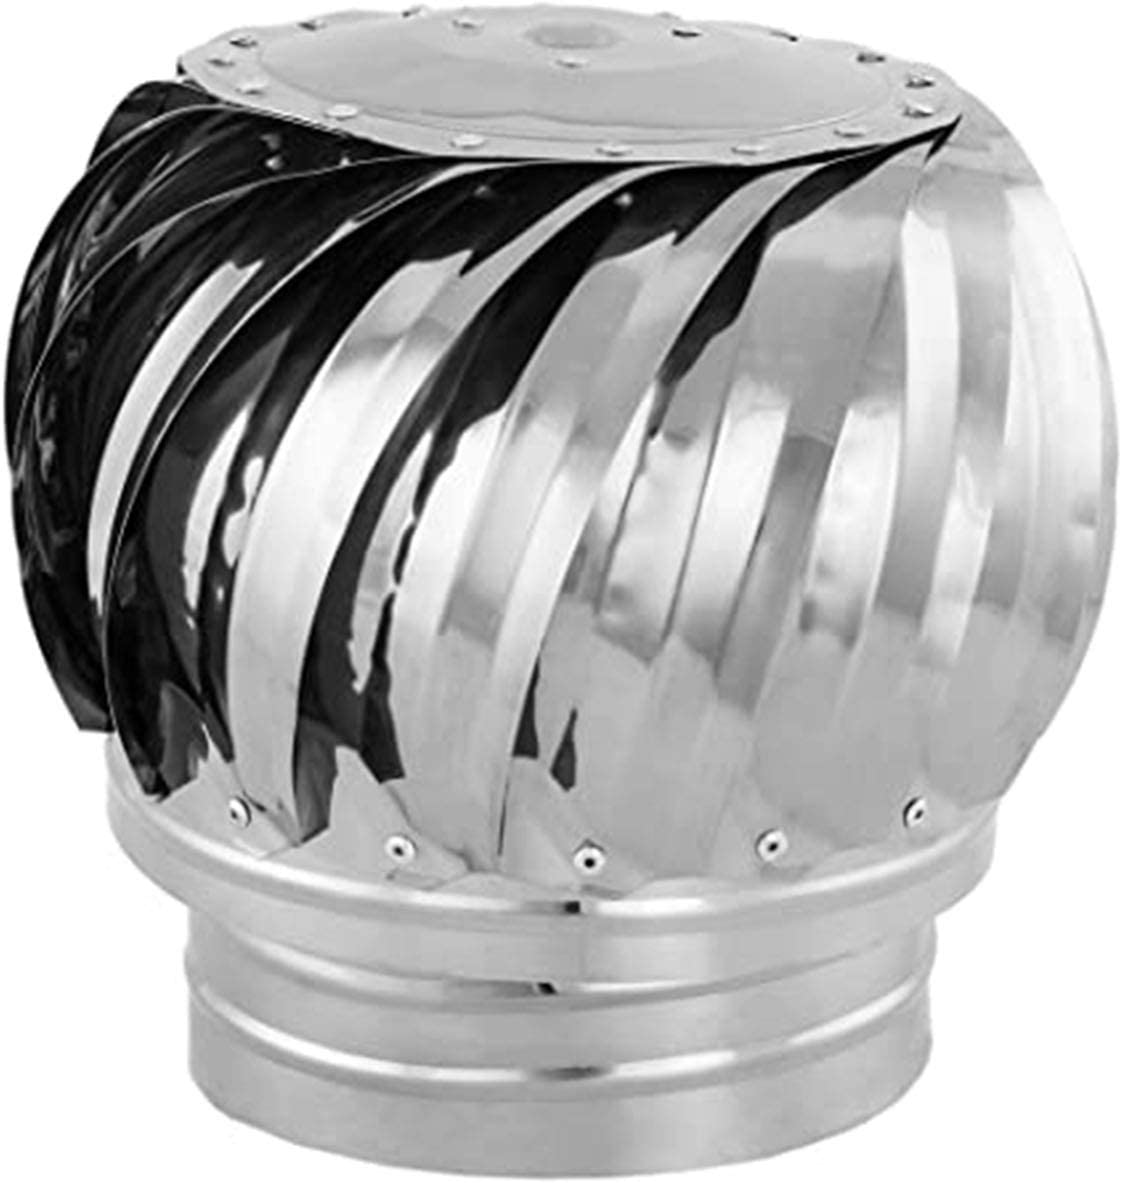 FZYE Tapa giratoria para Chimenea, Acero Inoxidable 304, Tapa de ventilación, giratoria giratoria, antivaho, se Adapta a la mayoría de Las chimeneas estándar con Abrazadera, 110 mm